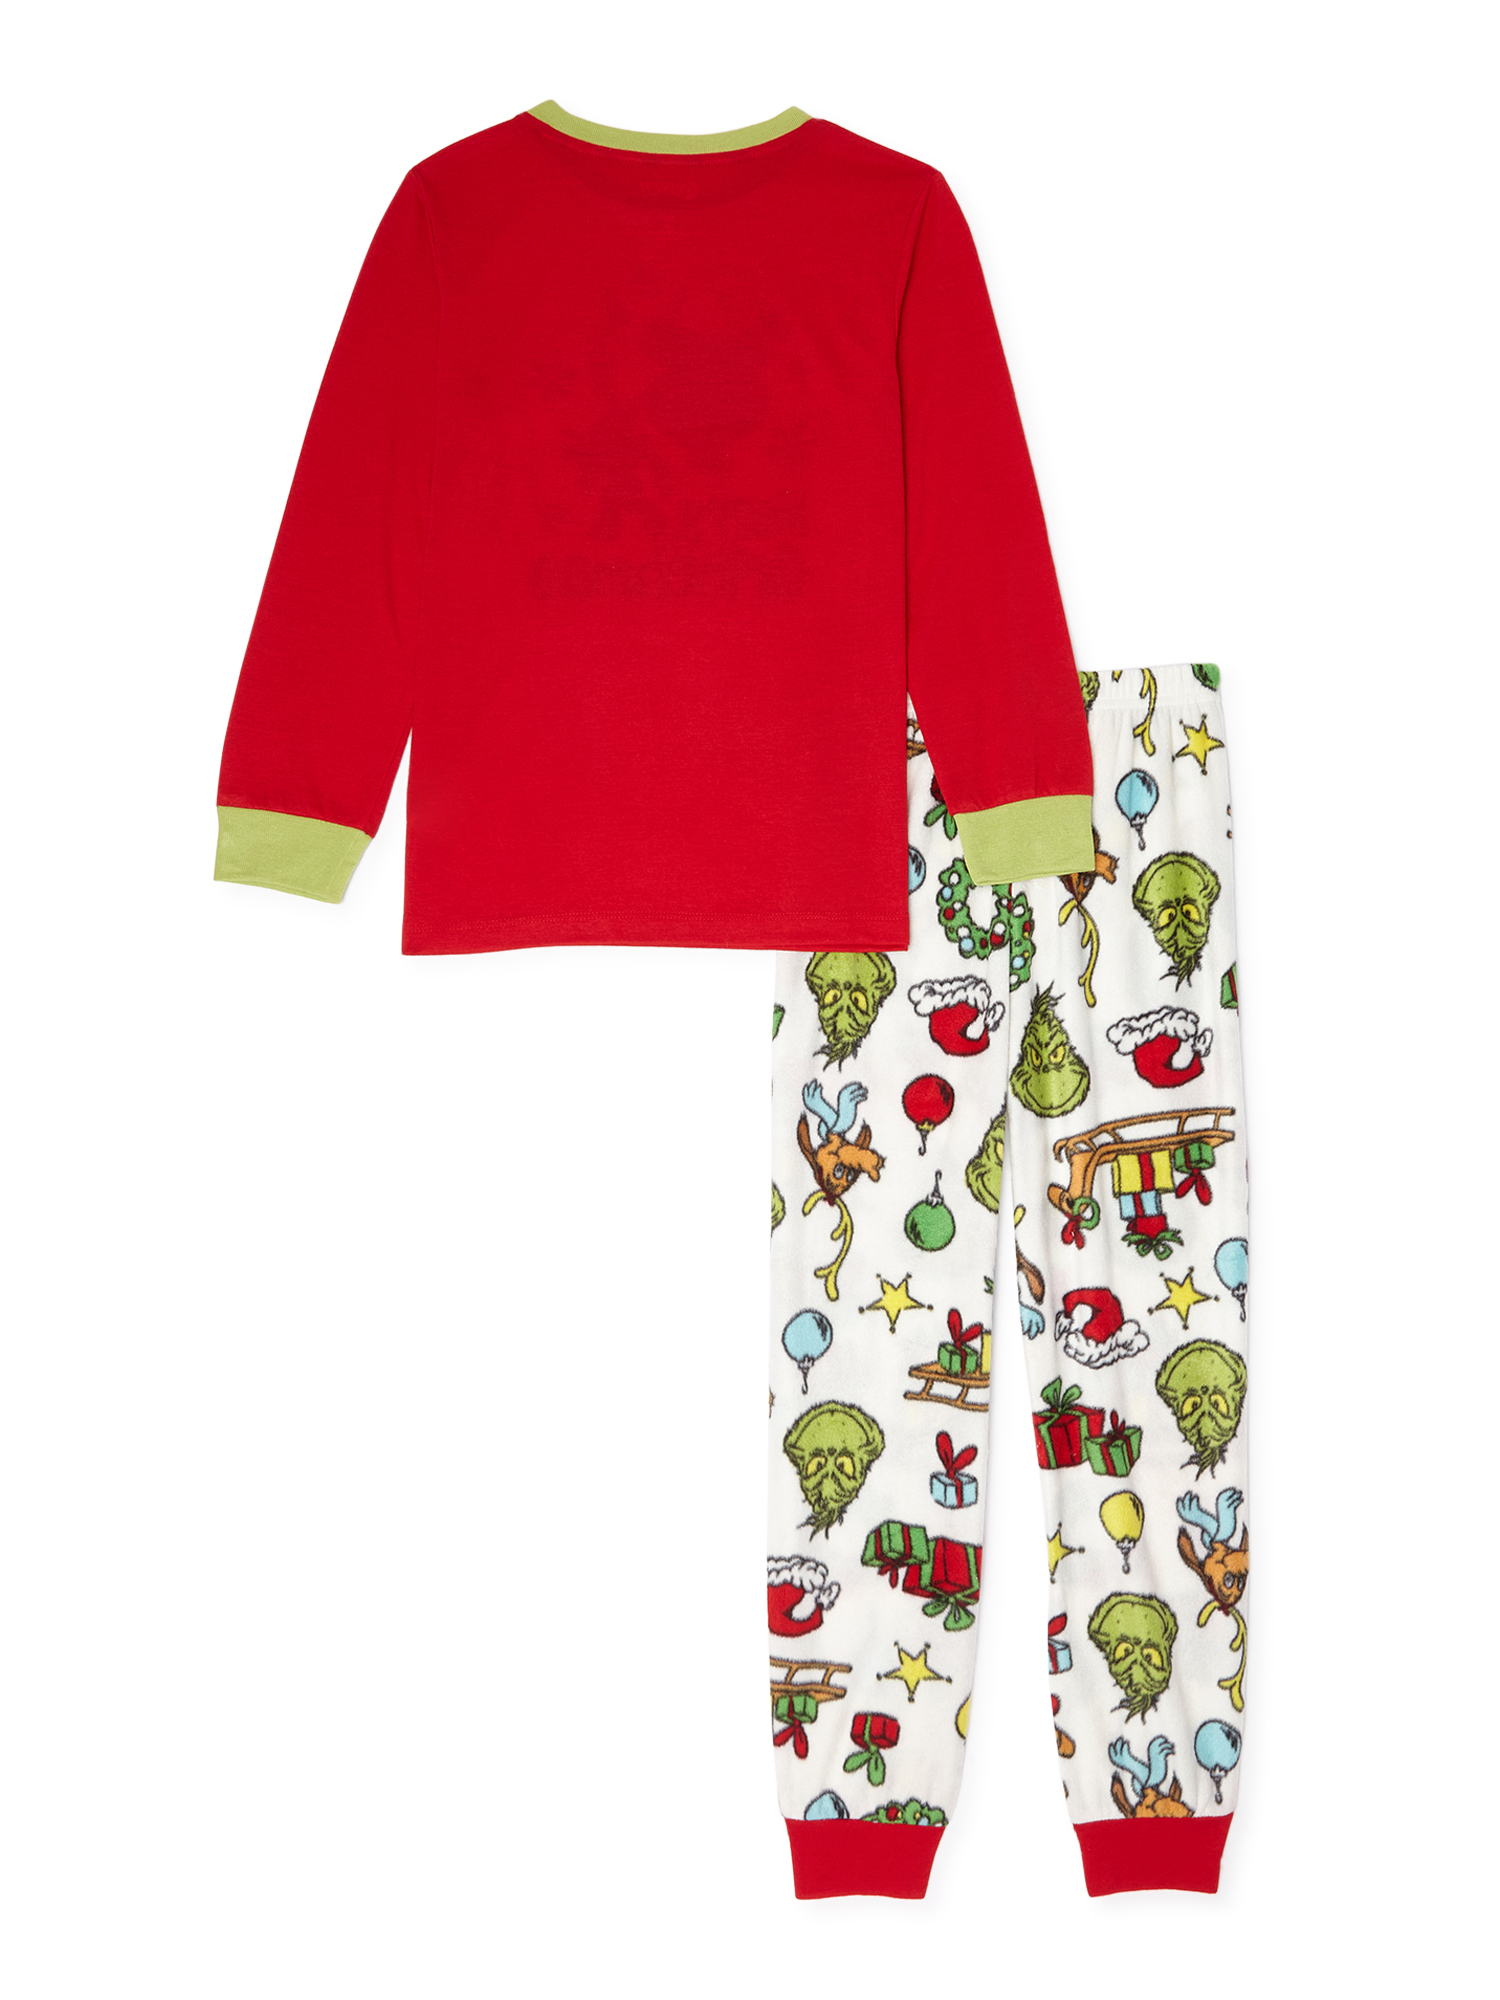 Dr Seuss The Grinch Christmas Pajamas Boy Girl Blanket Sleeper 12 Months 12M